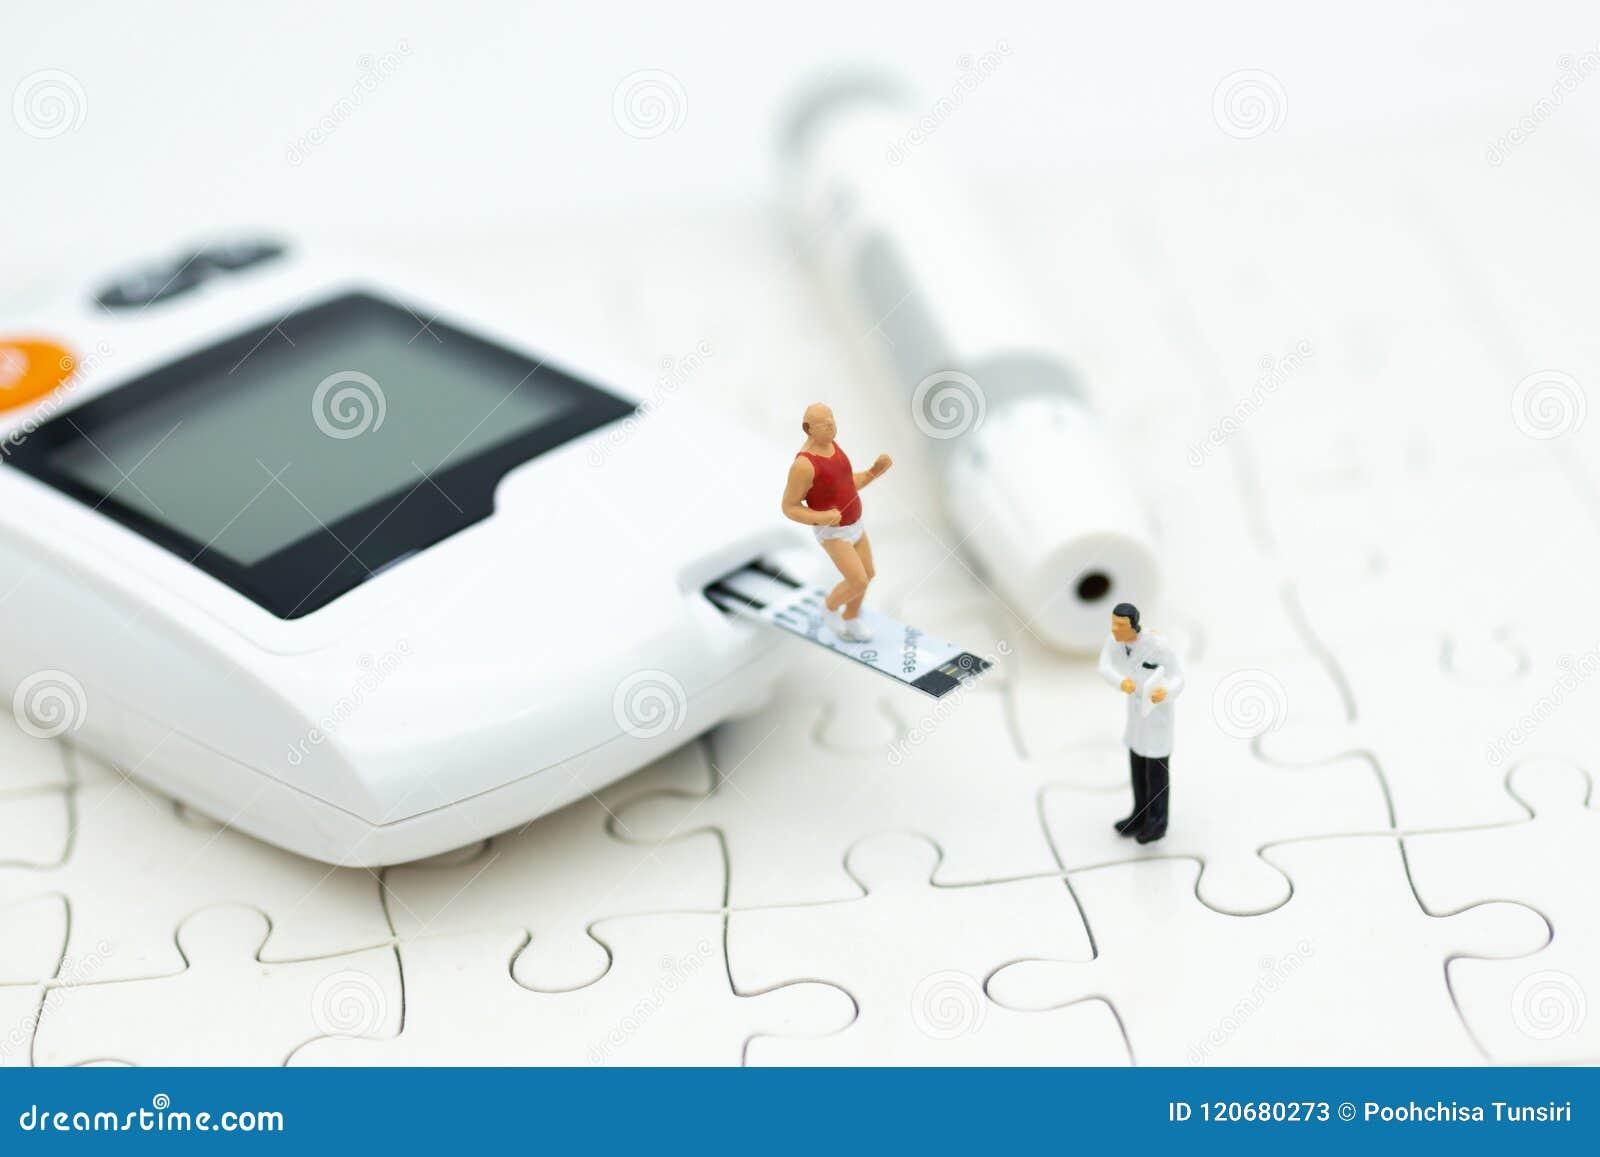 The use of glucose in medicine 94